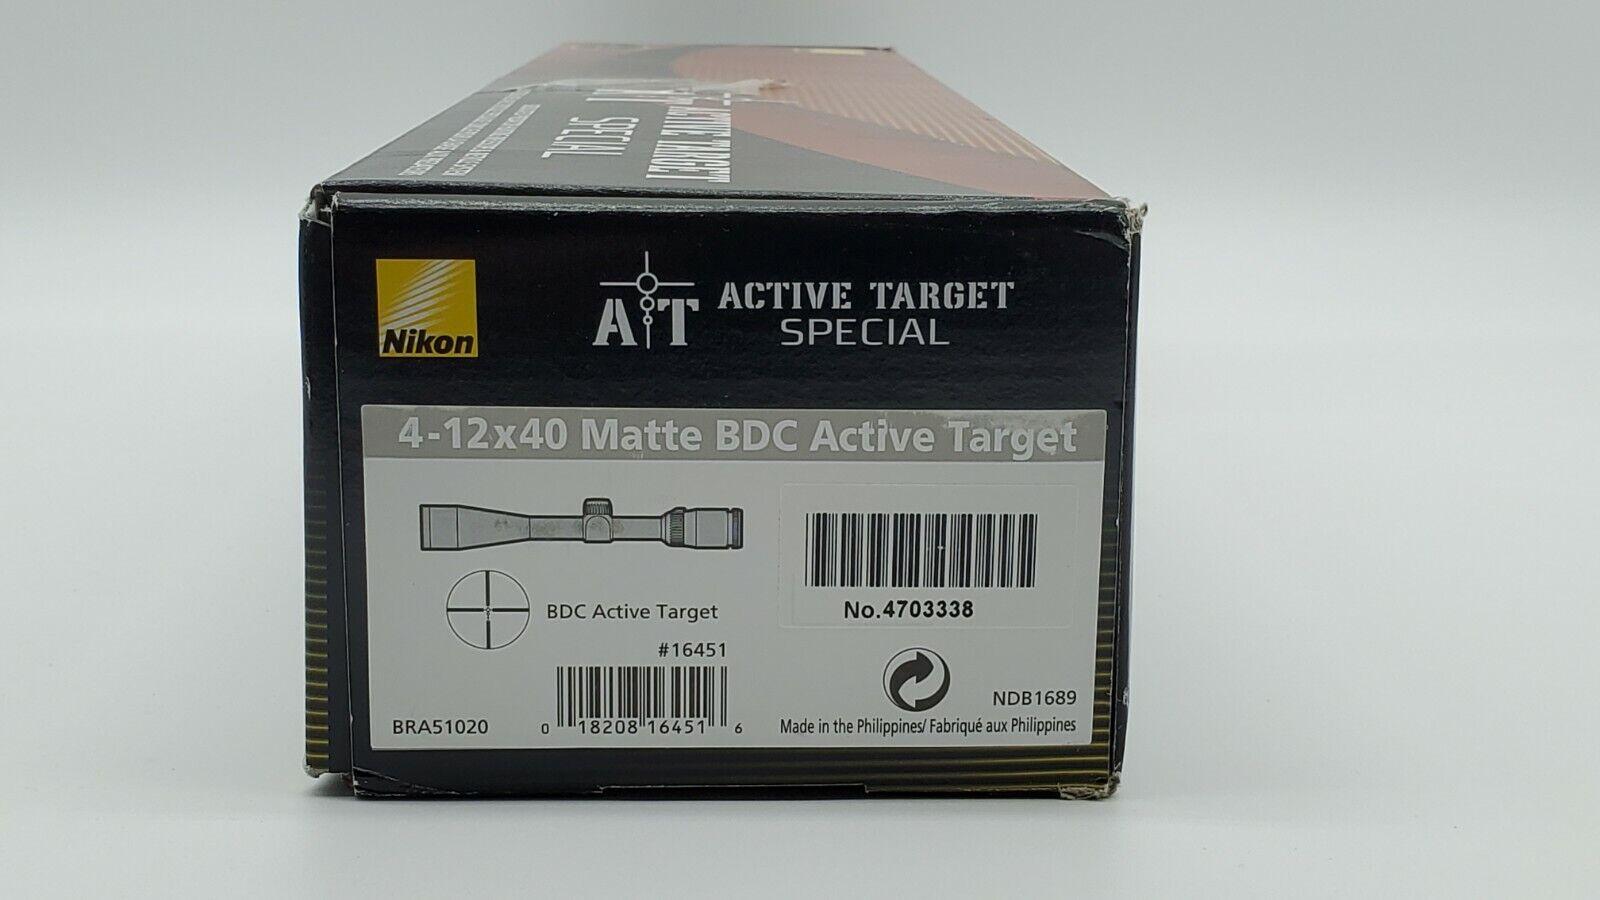 Nikon Active Target Special Rifle Scope - 4-12x40mm SFP BDC Predator 16451 - $219.99